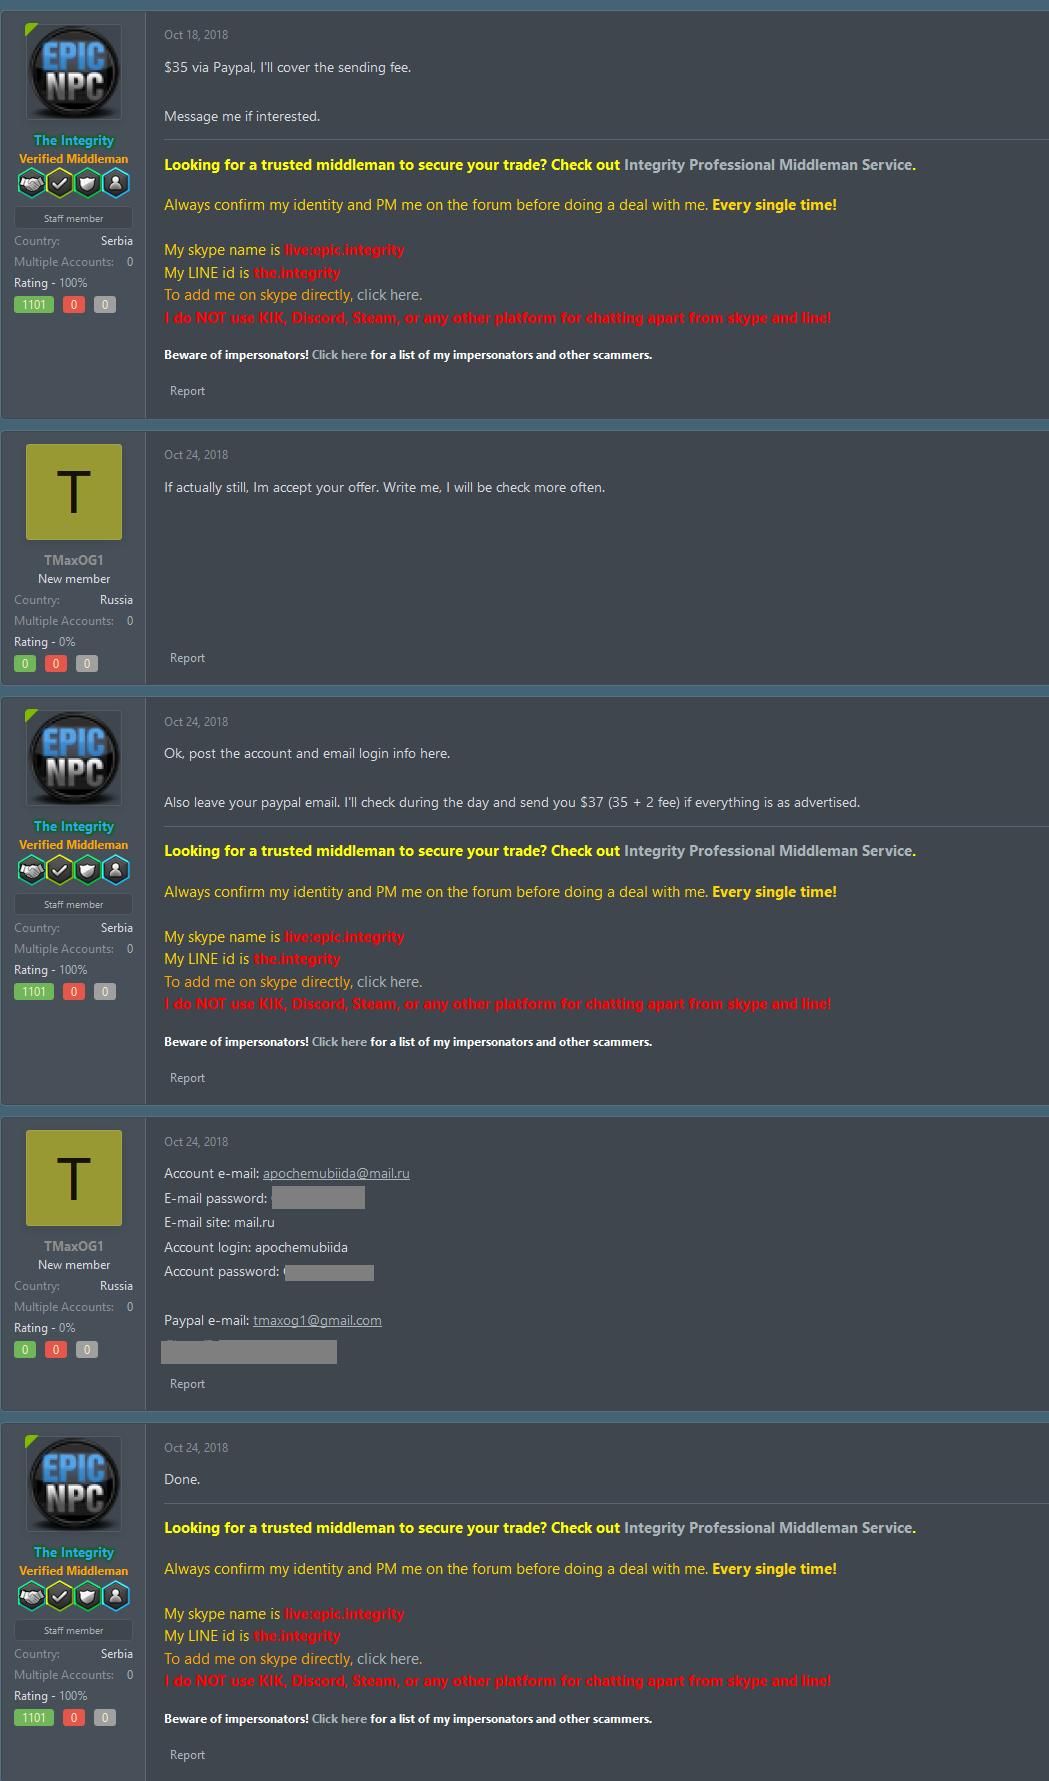 TMaxOG1 recalled Steam account | EpicNPC Marketplace